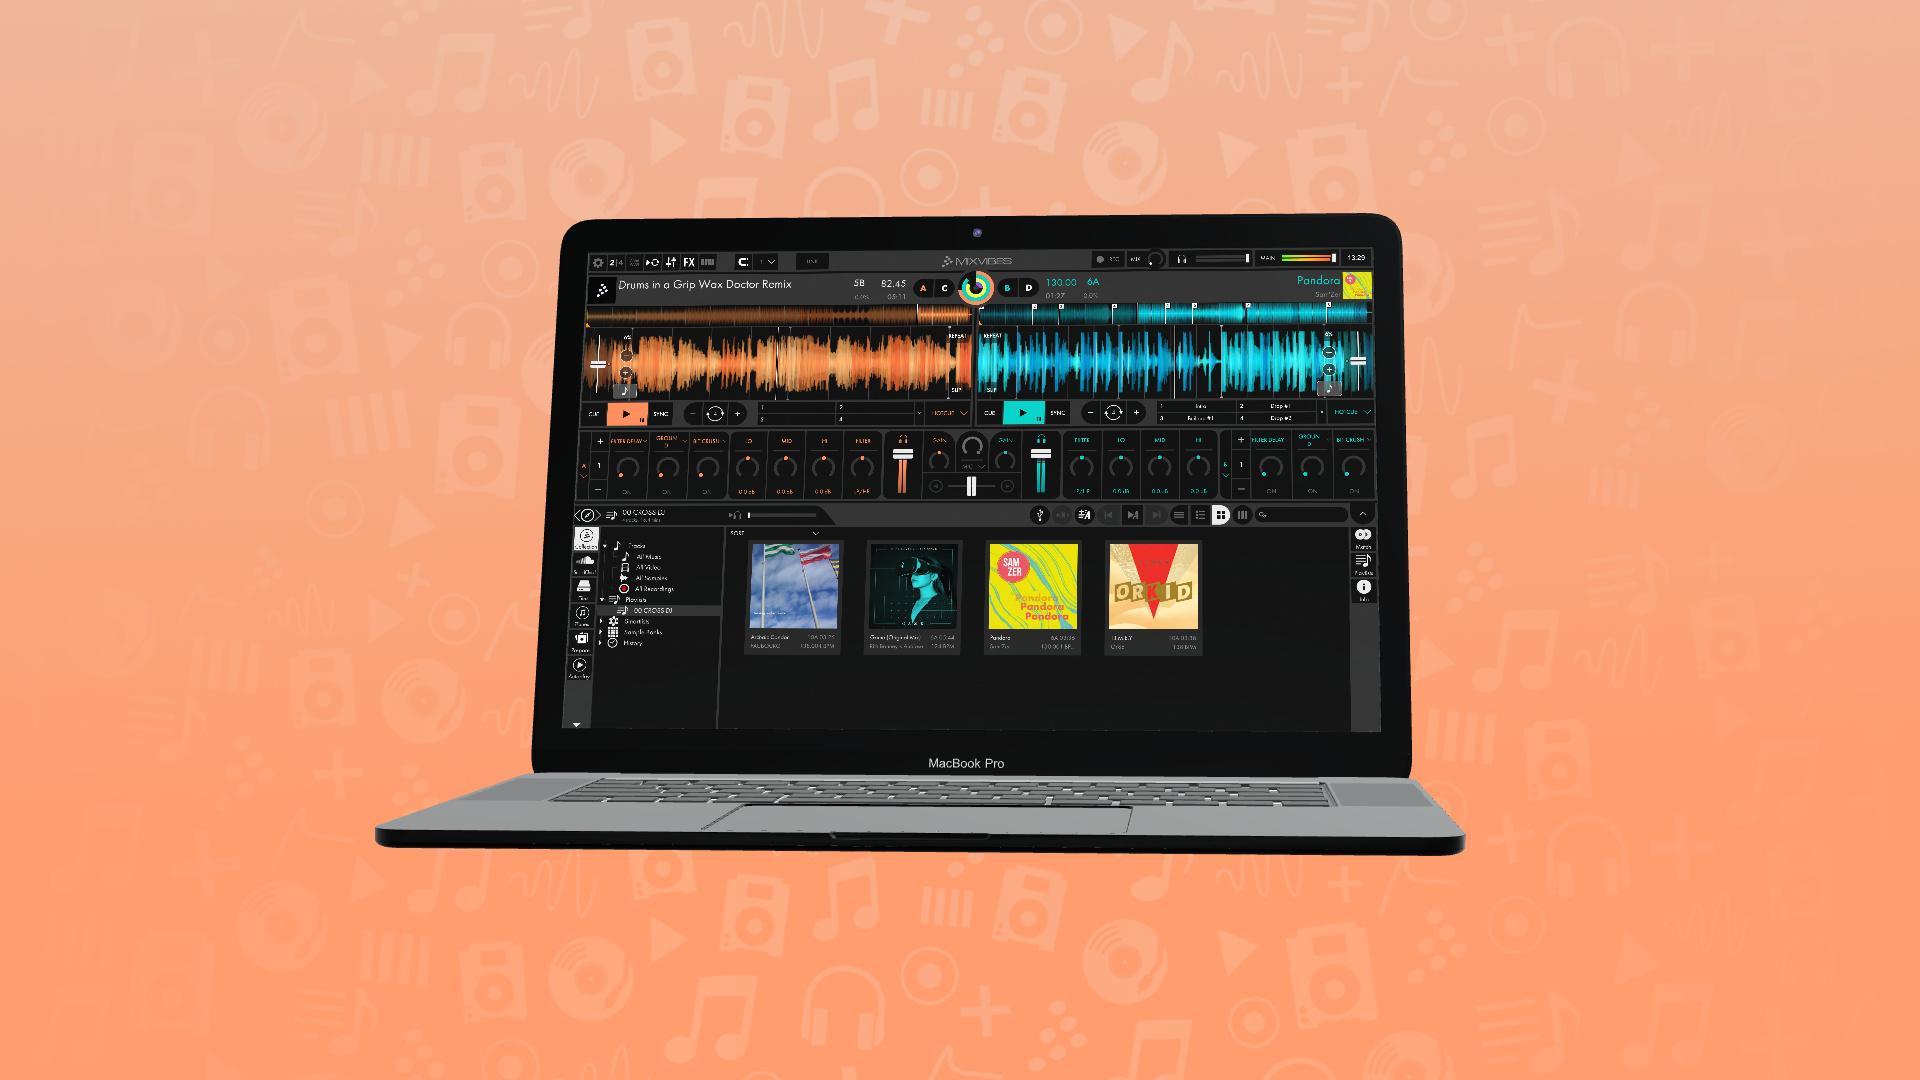 Macbook displaying Cross DJ 4